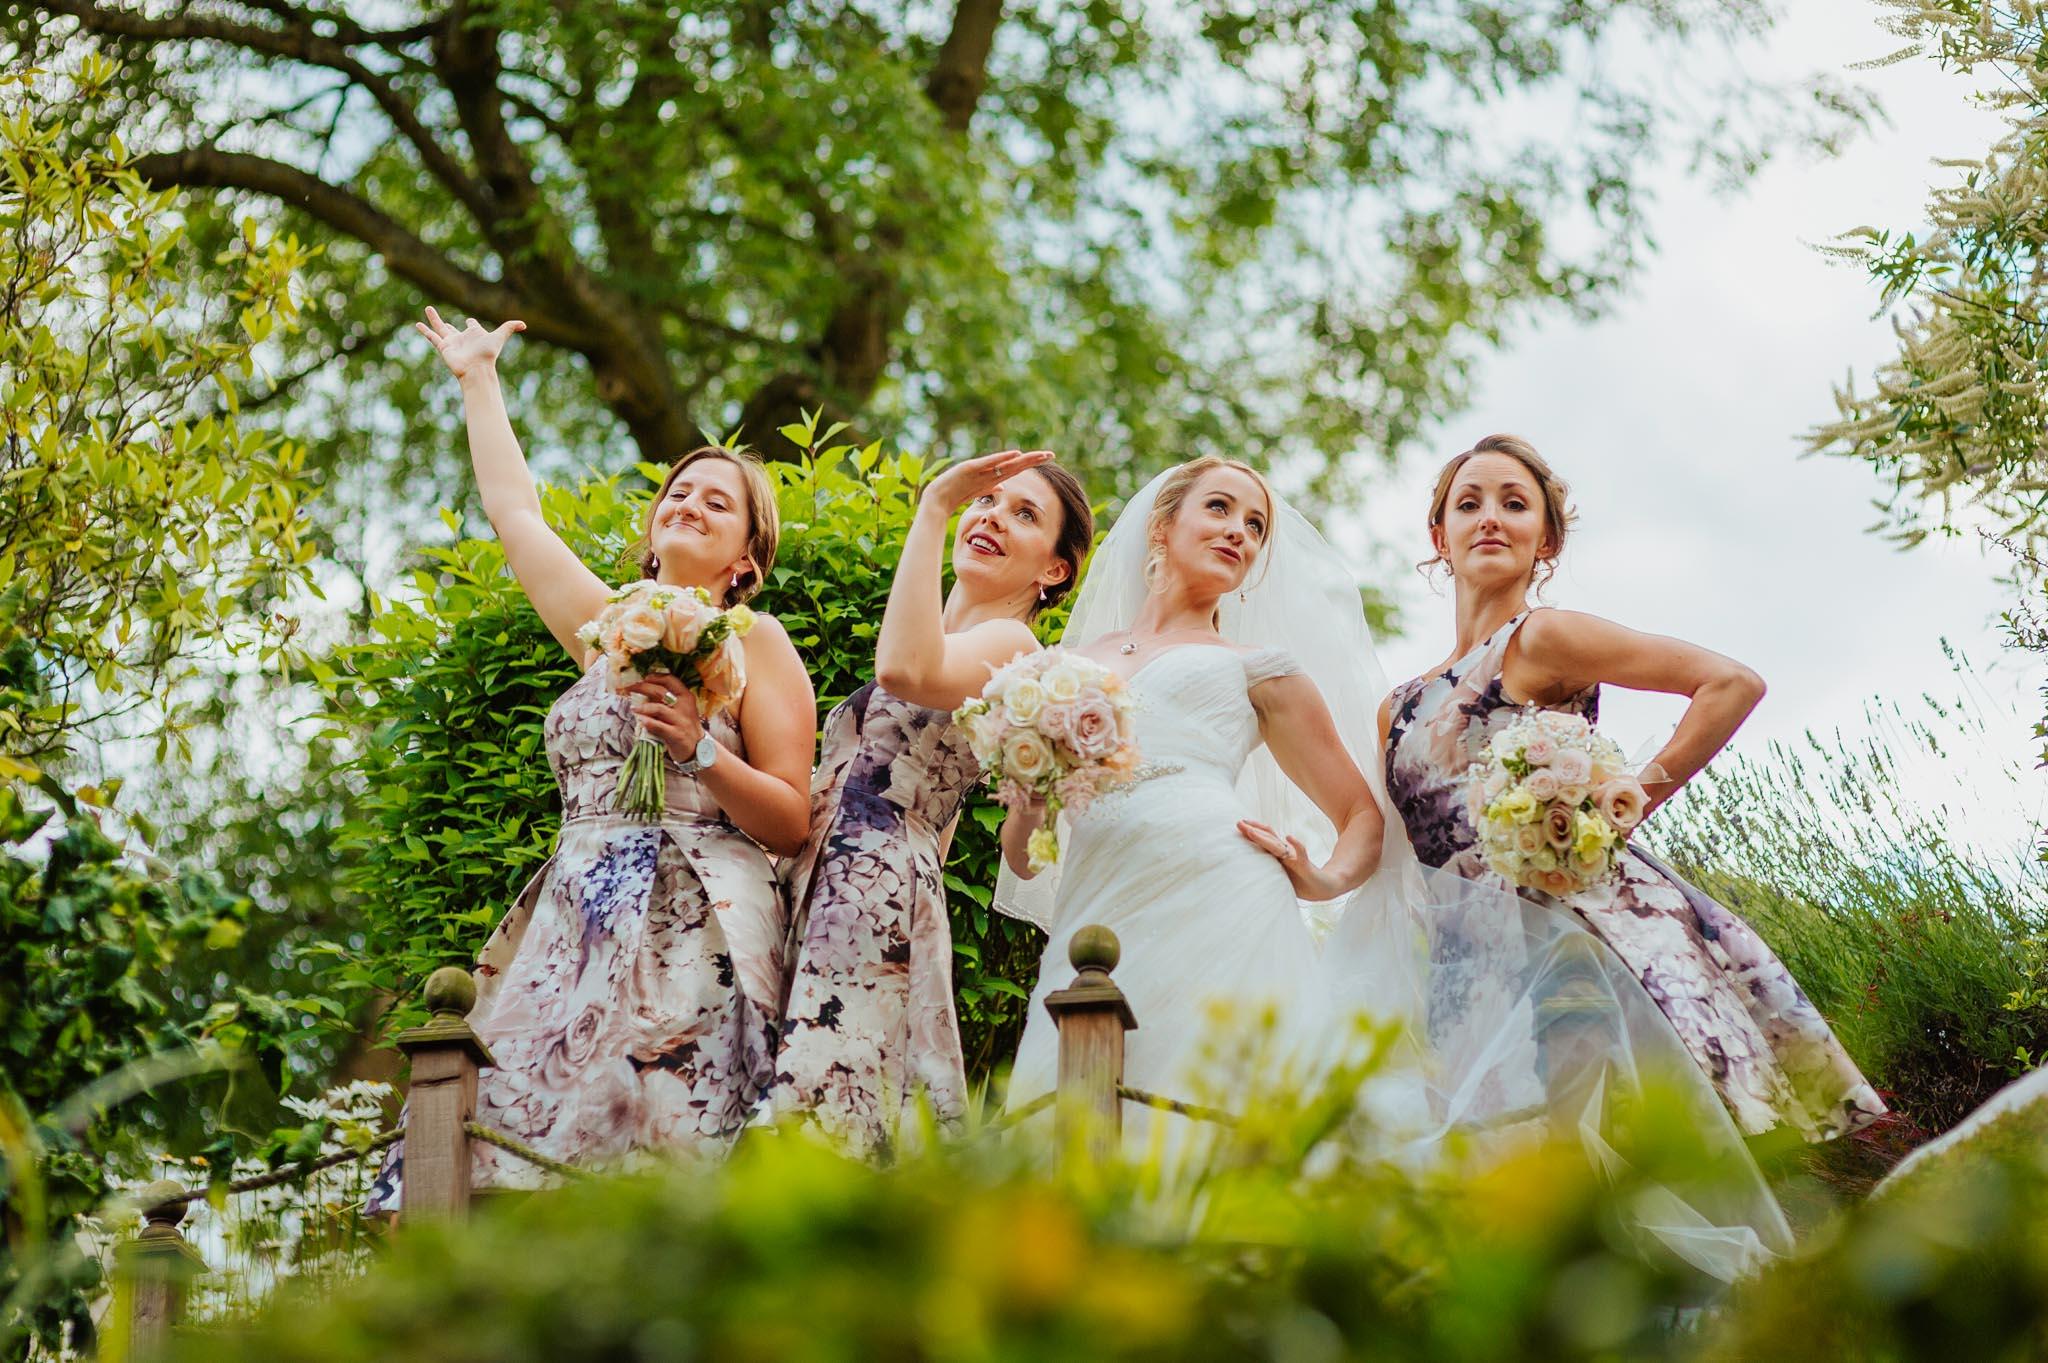 Georgina + Mike - Wedding photography in Malvern, Worcestershire 65